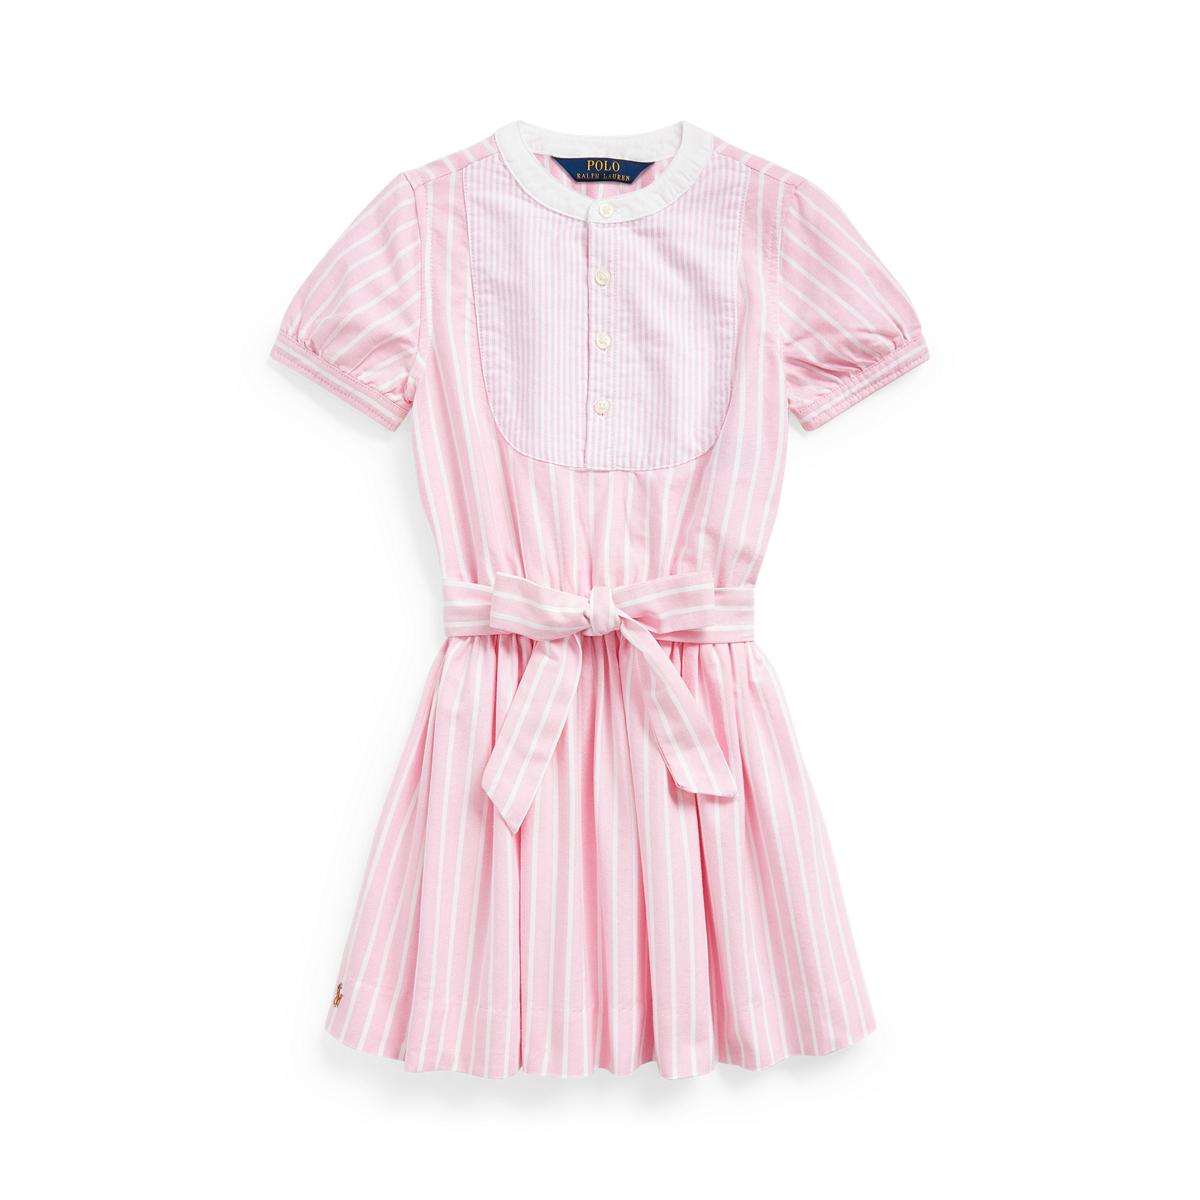 Mixed-Stripe Cotton Dress